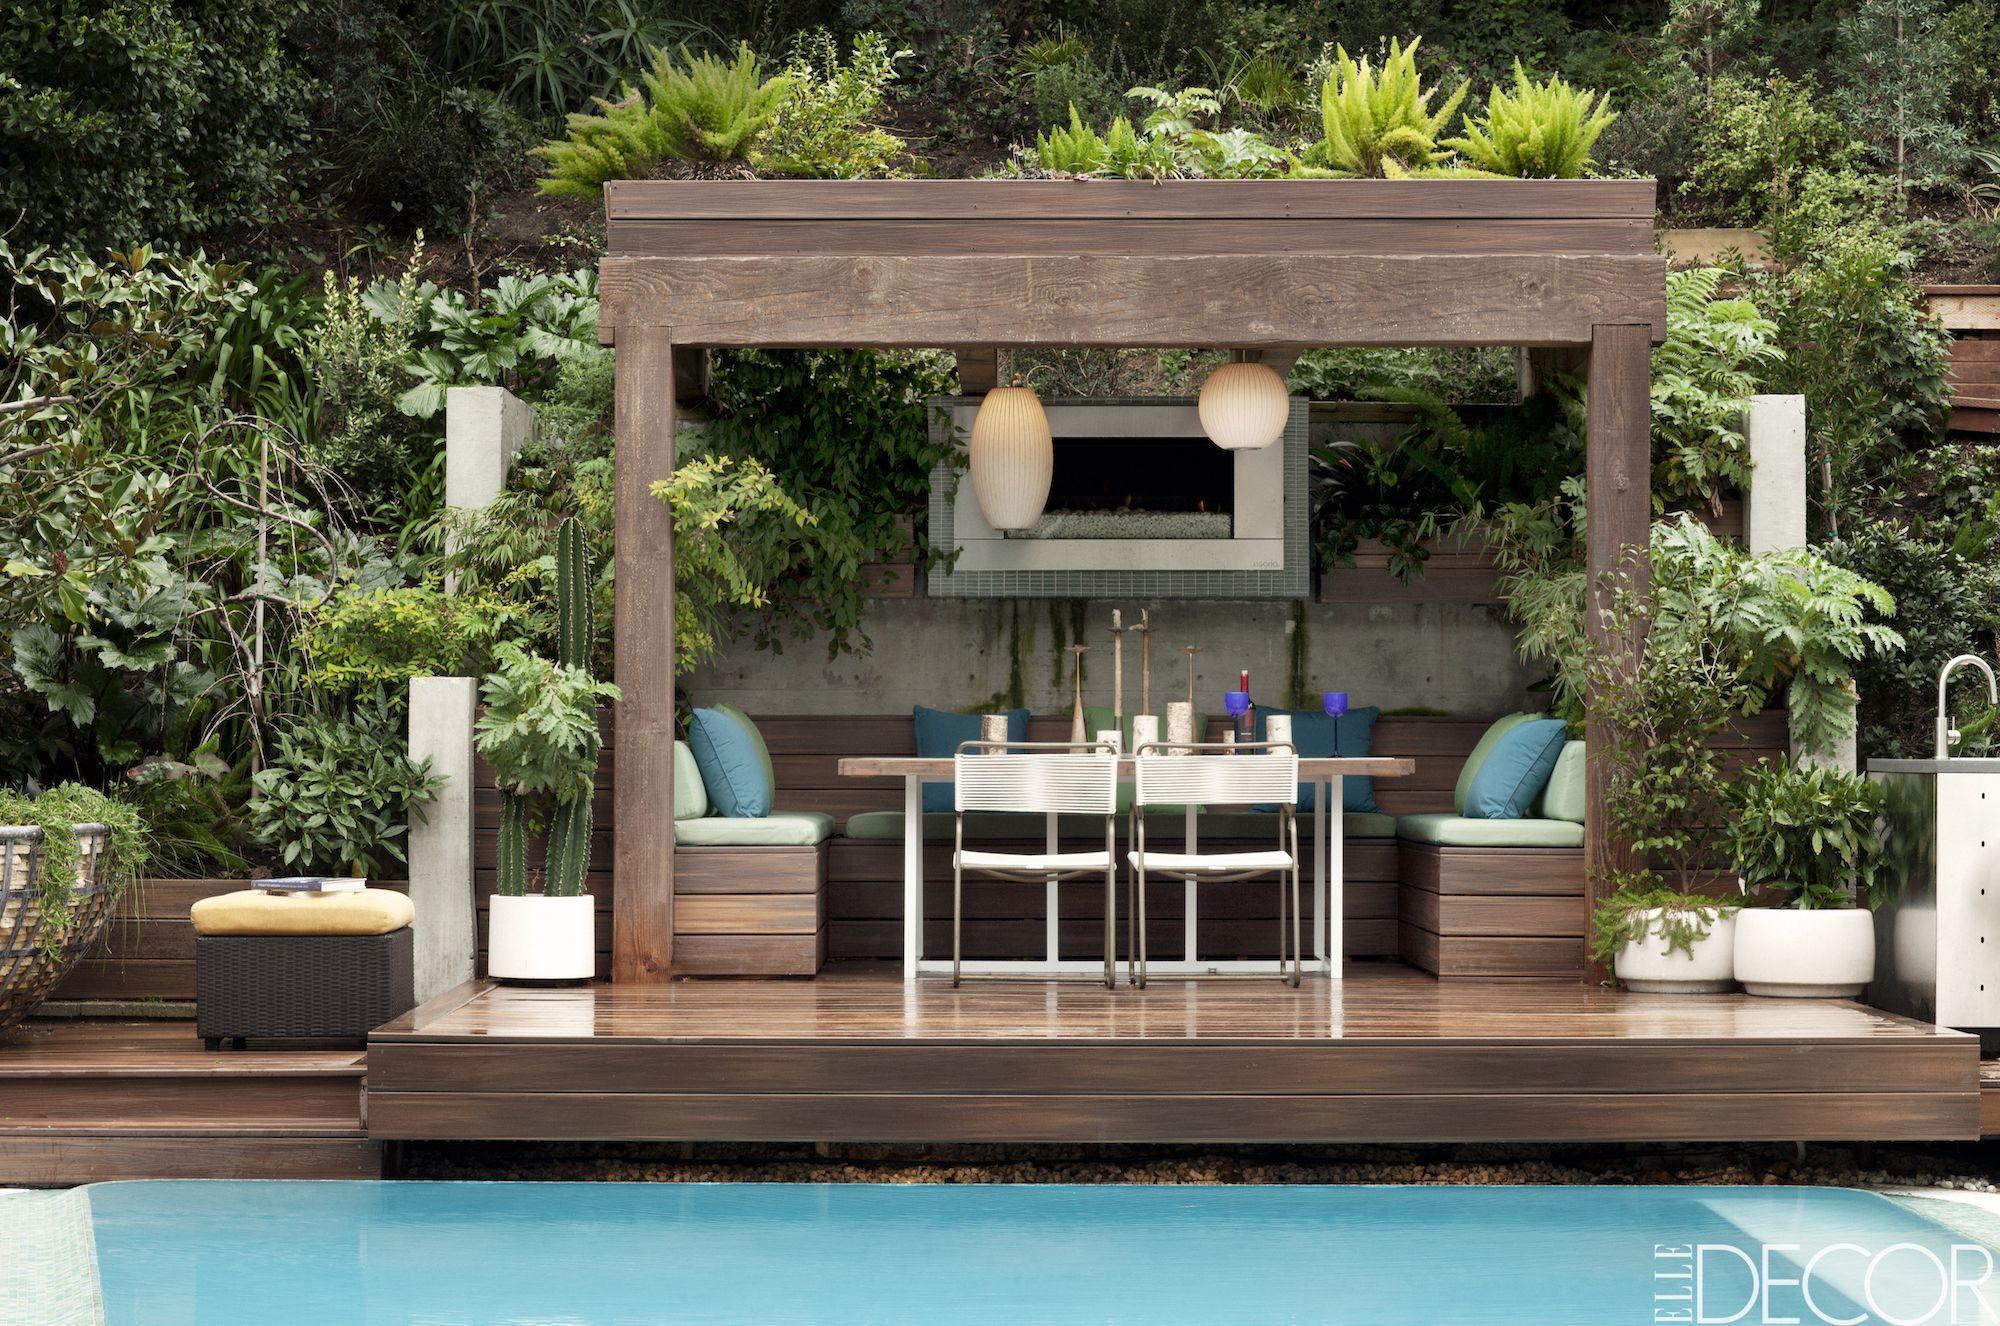 Fullsize Of Backyard Ideas Patio